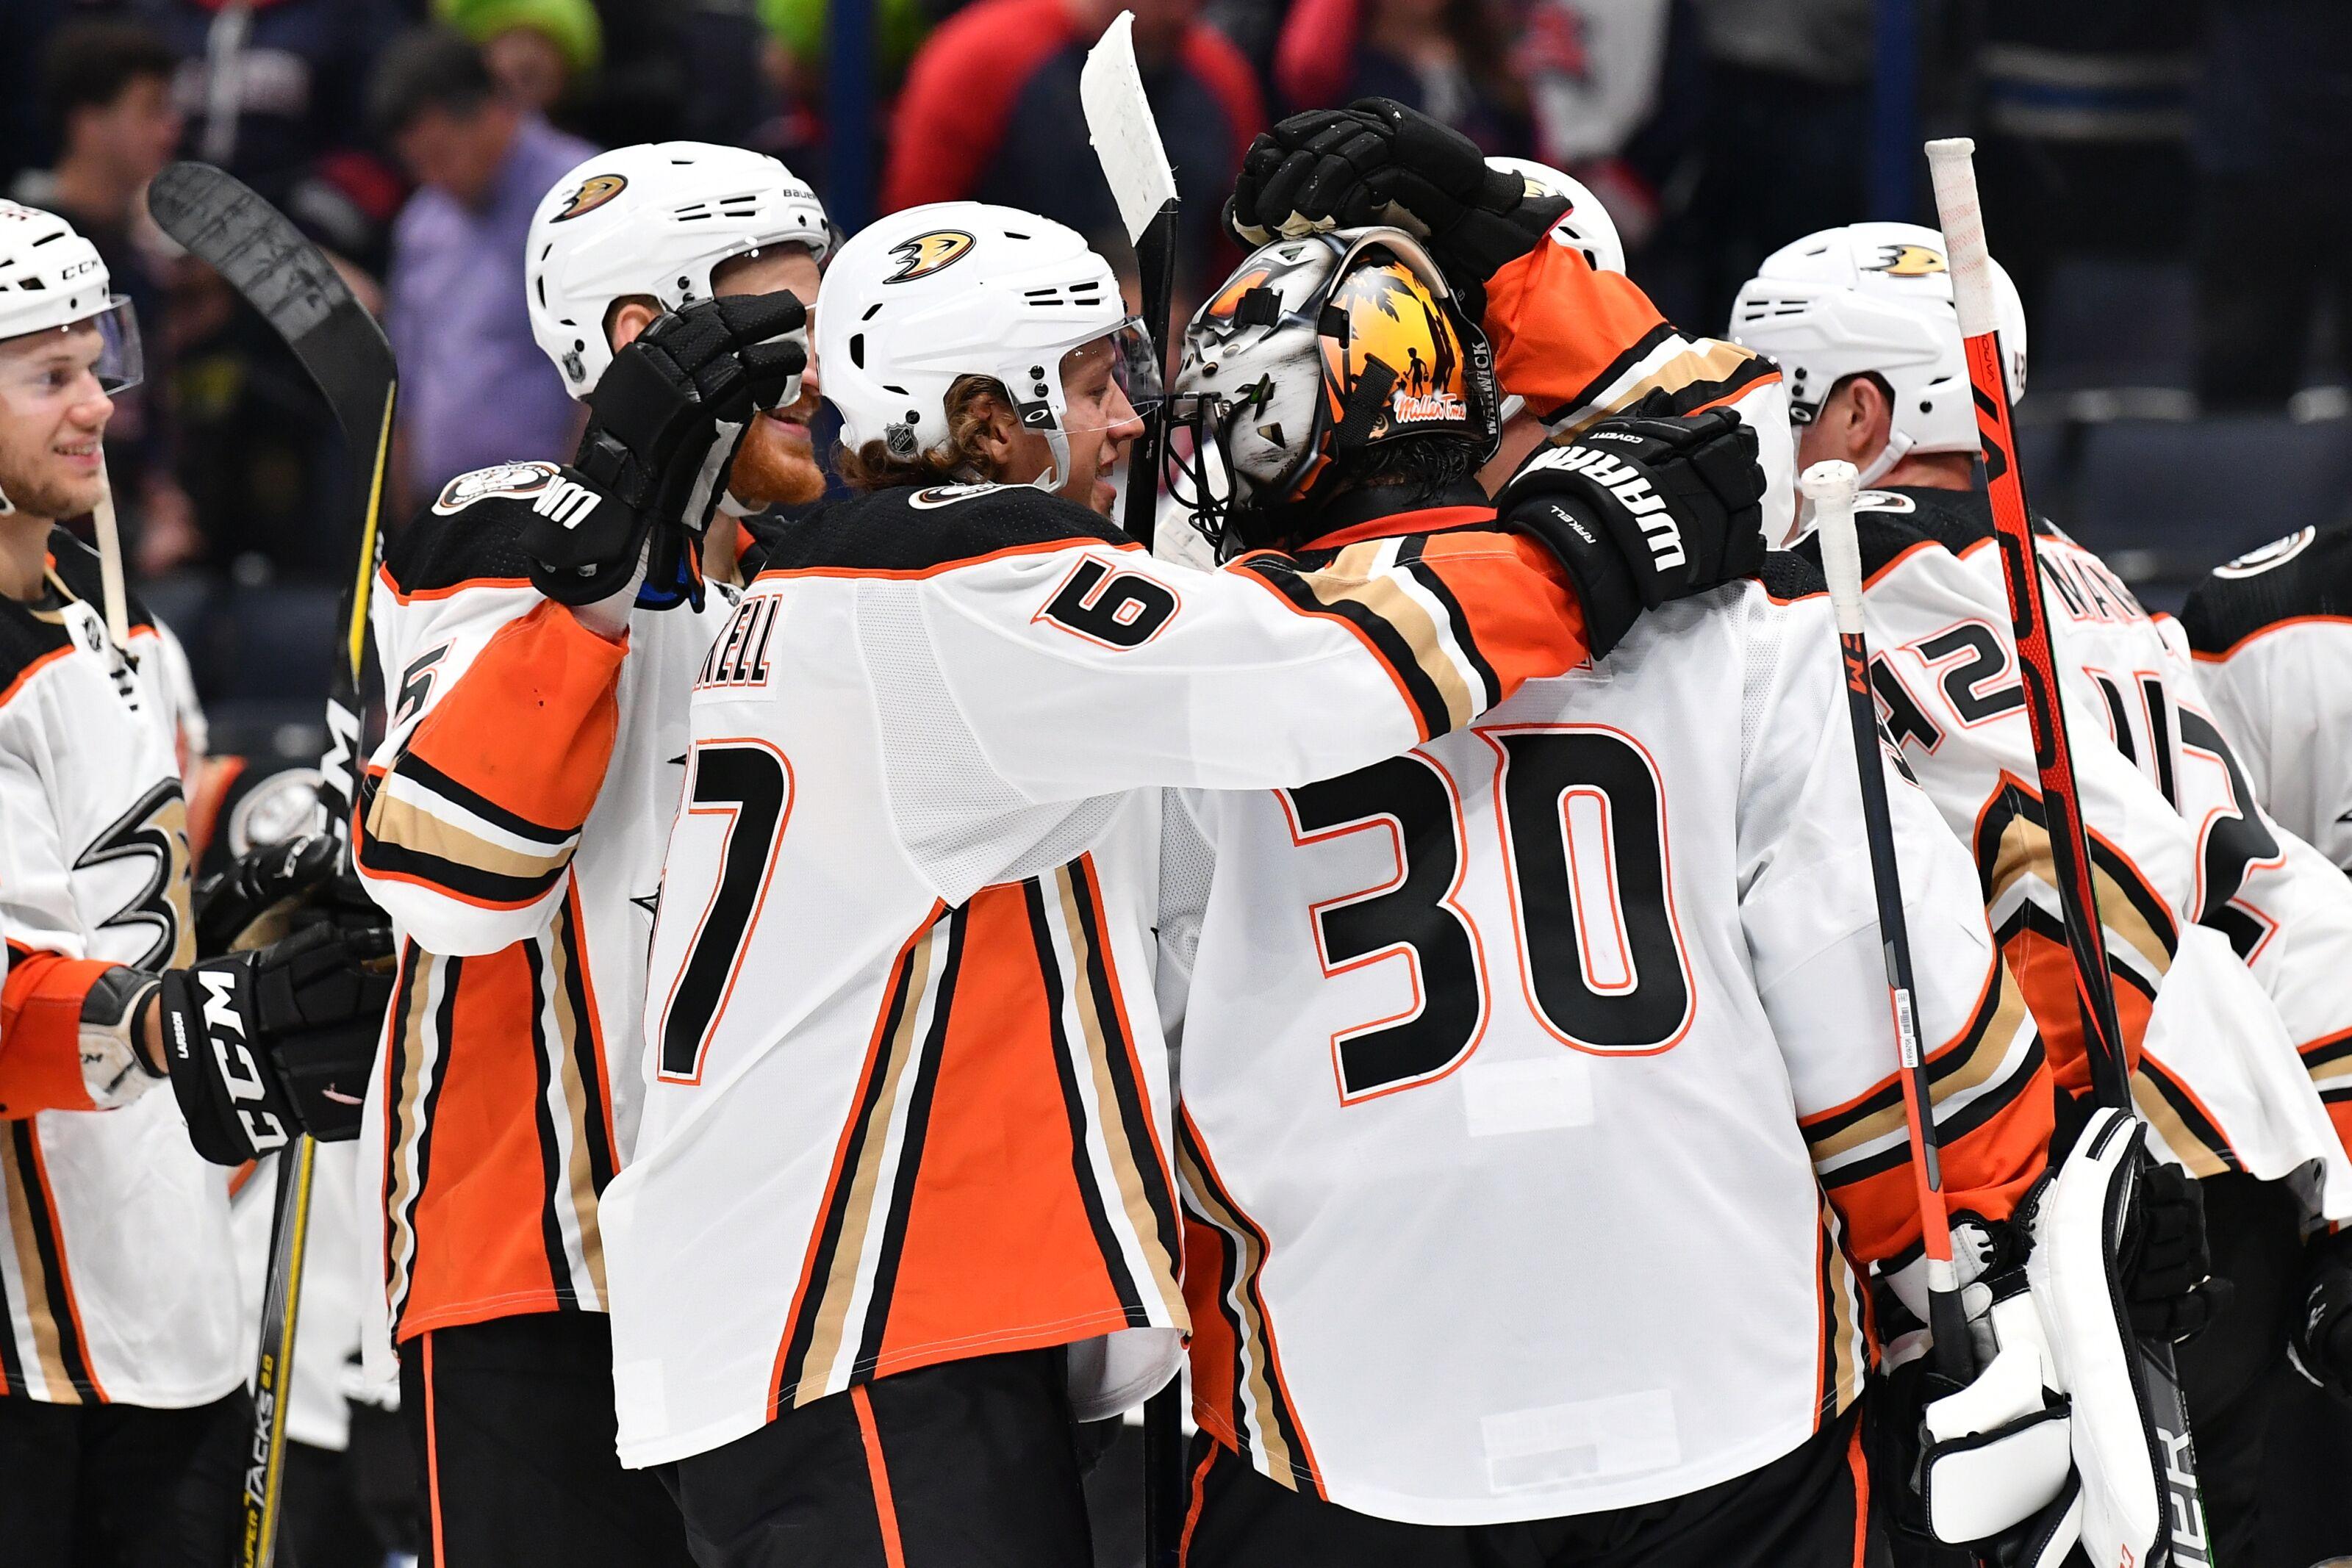 Anaheim Ducks finding early success in 2019-20 season